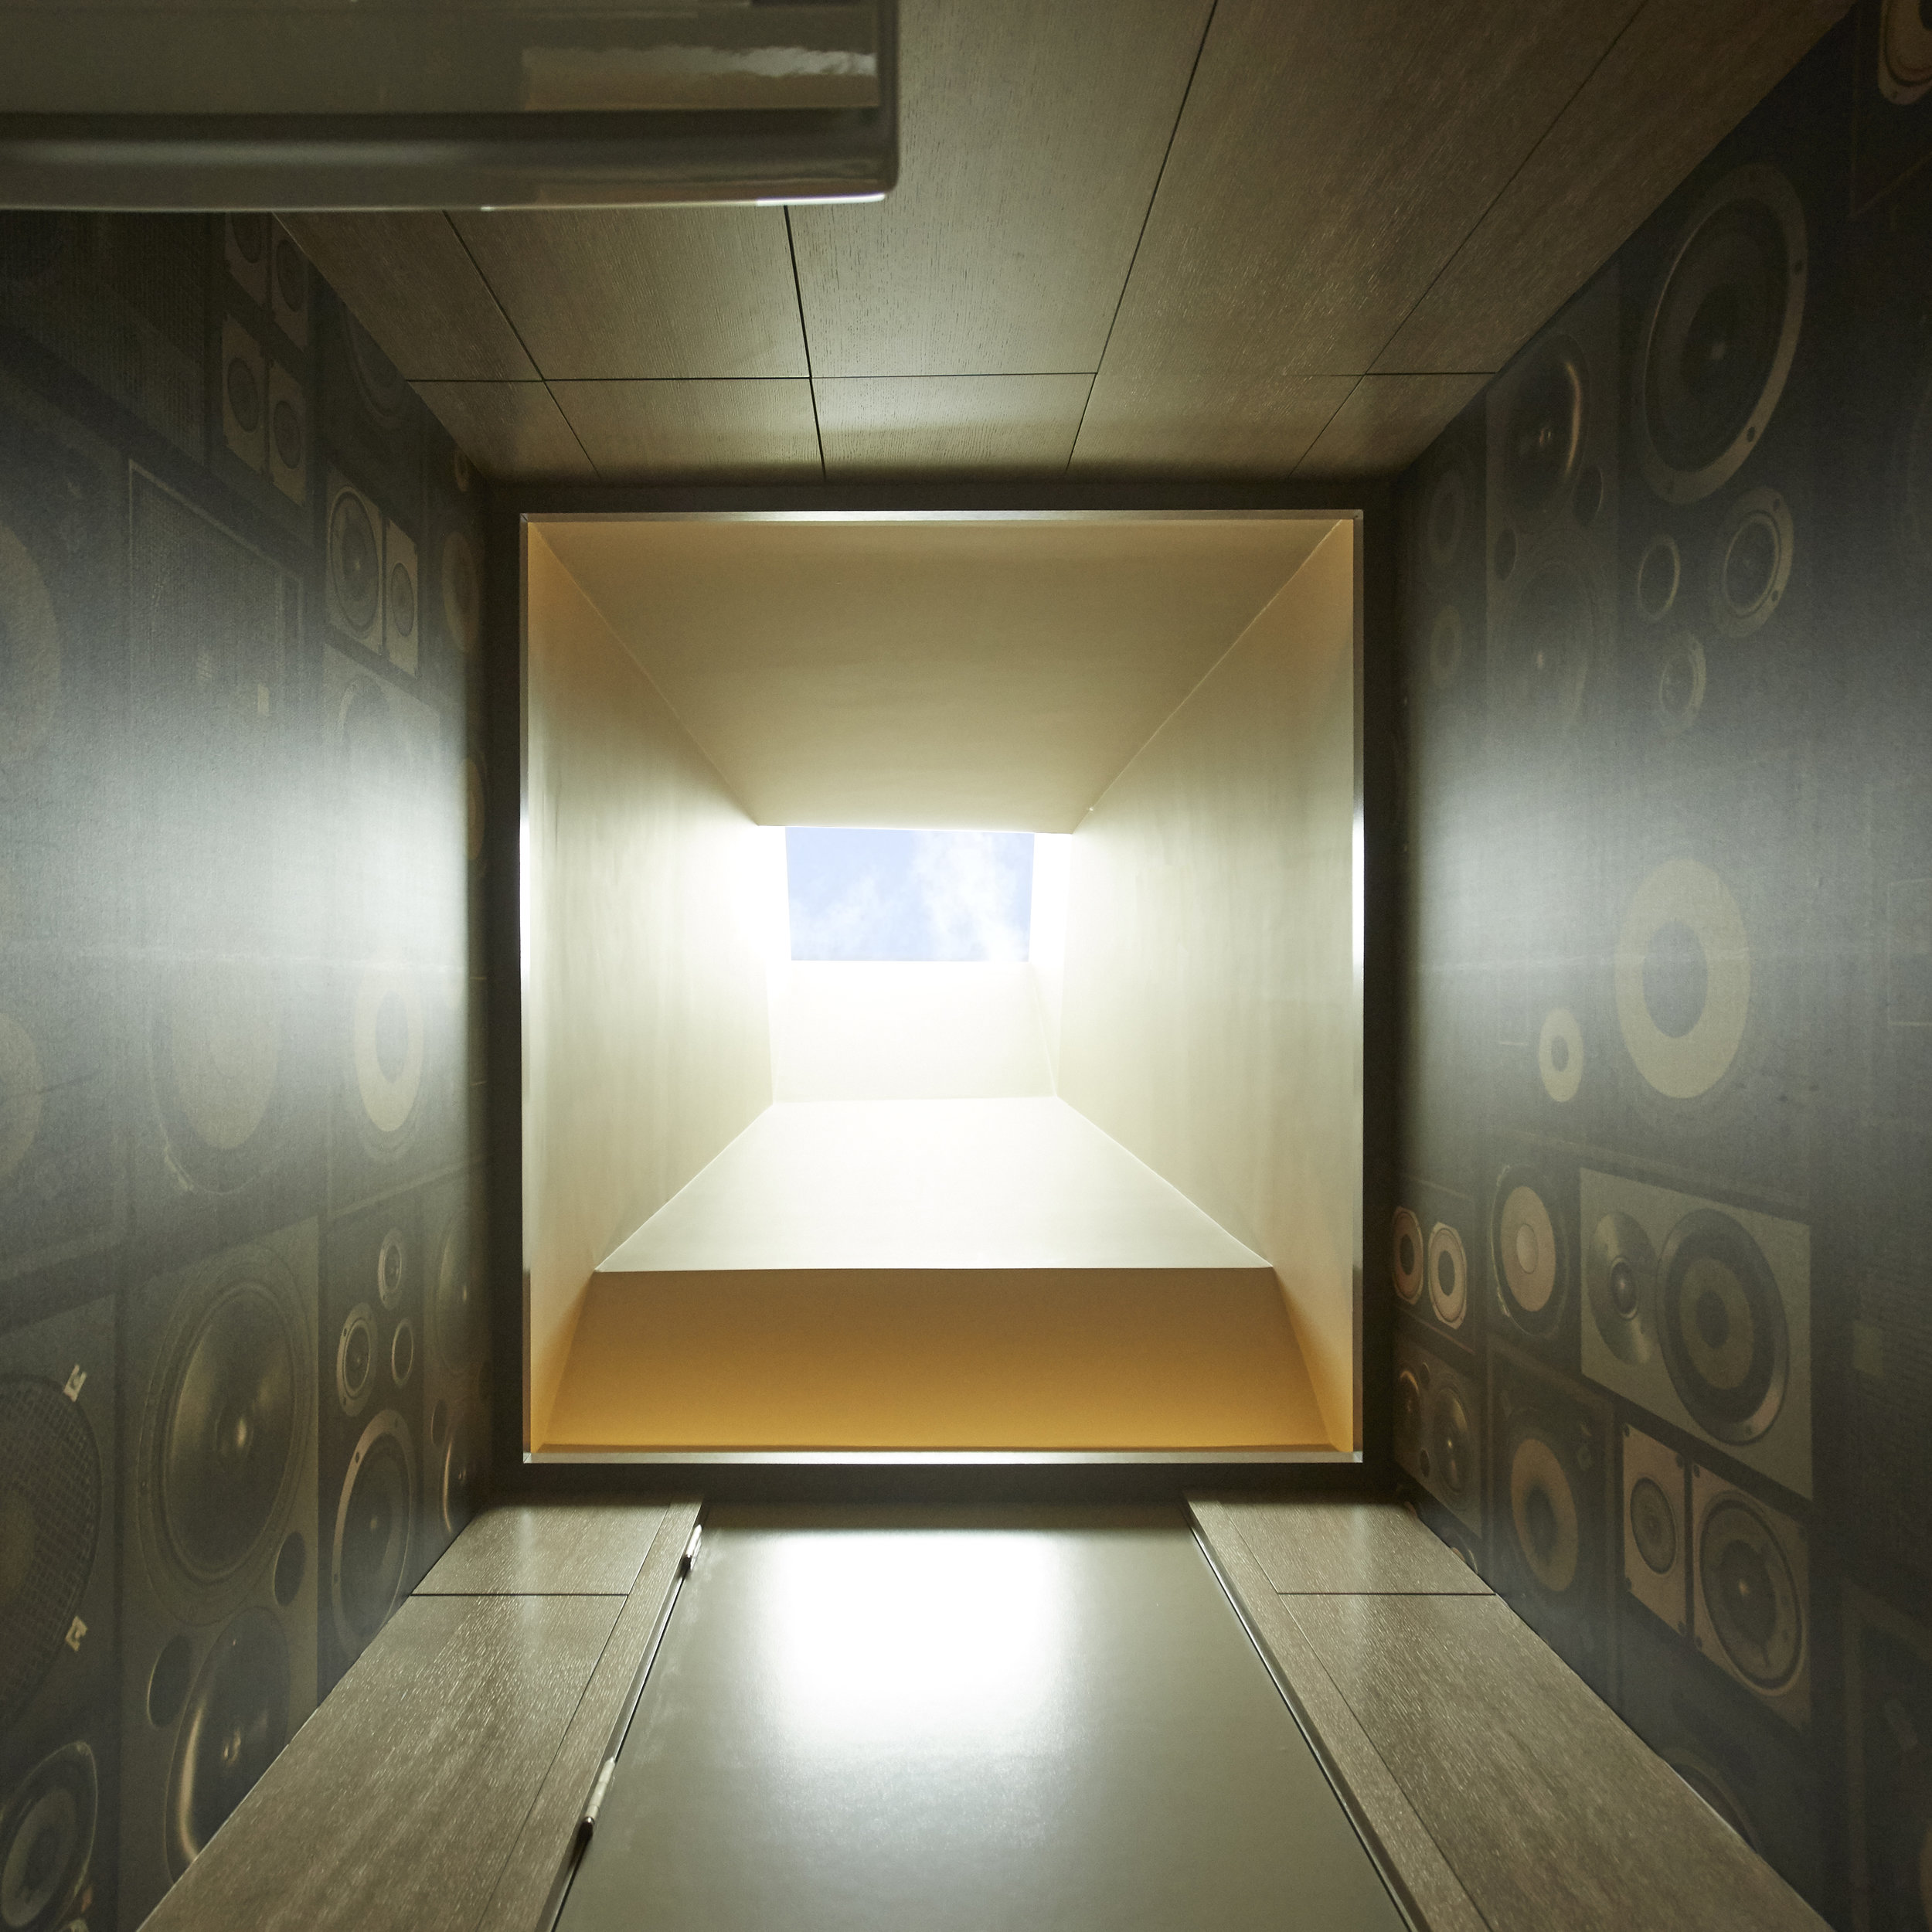 kennard architects - _L1A9762 R sq.jpg